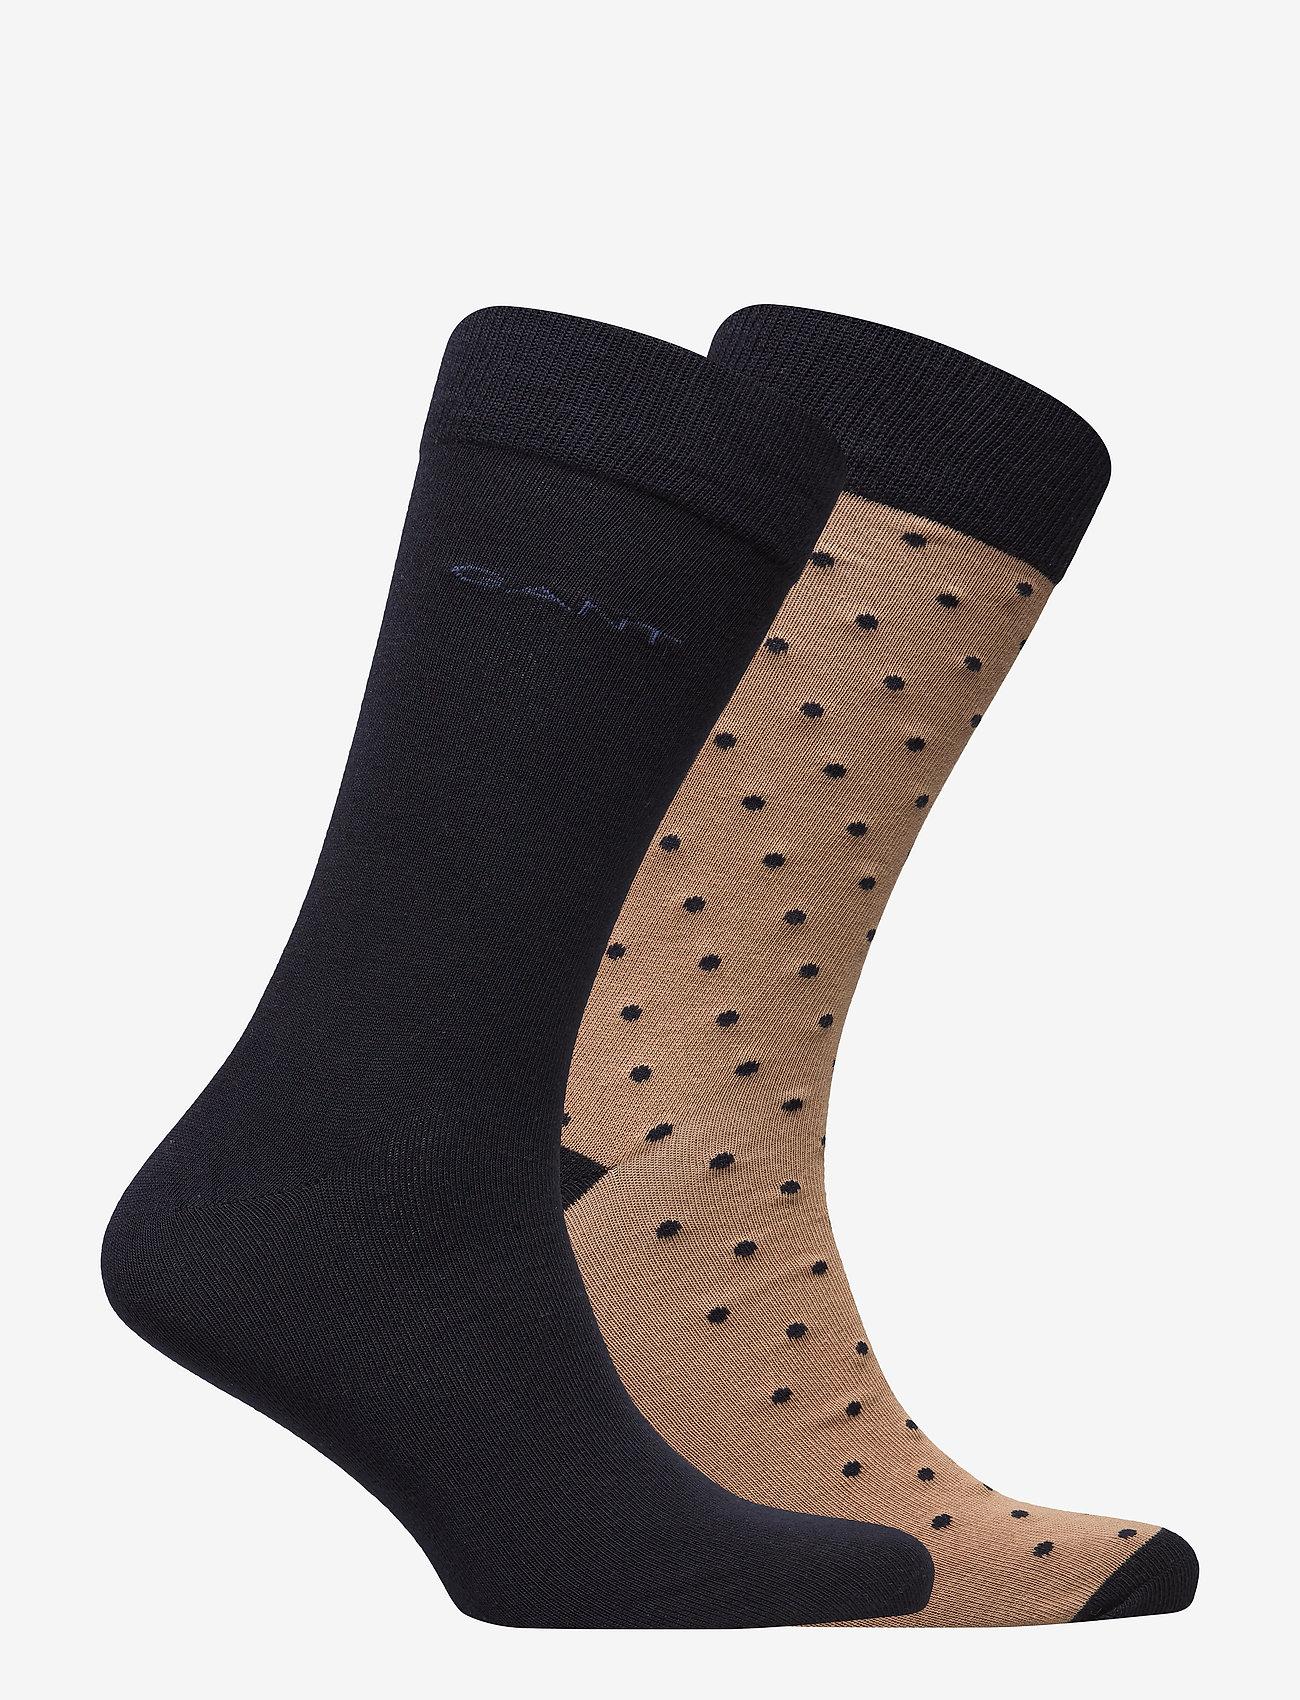 GANT - 2-PACK SOLID AND DOT SOCKS - chaussettes régulières - warm khaki - 1